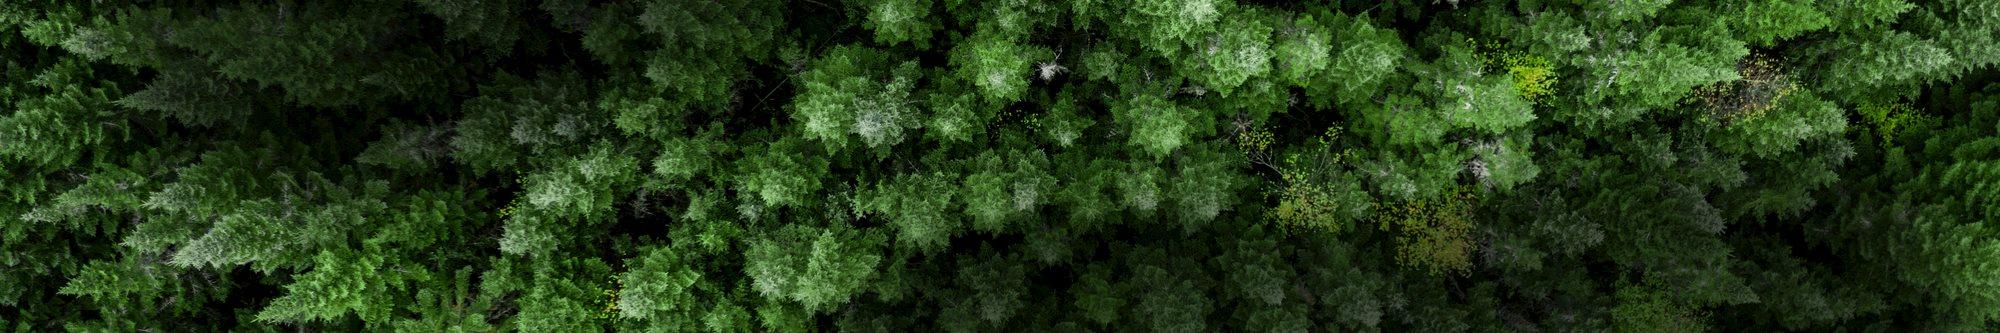 Sustainability-Dunkler.psd